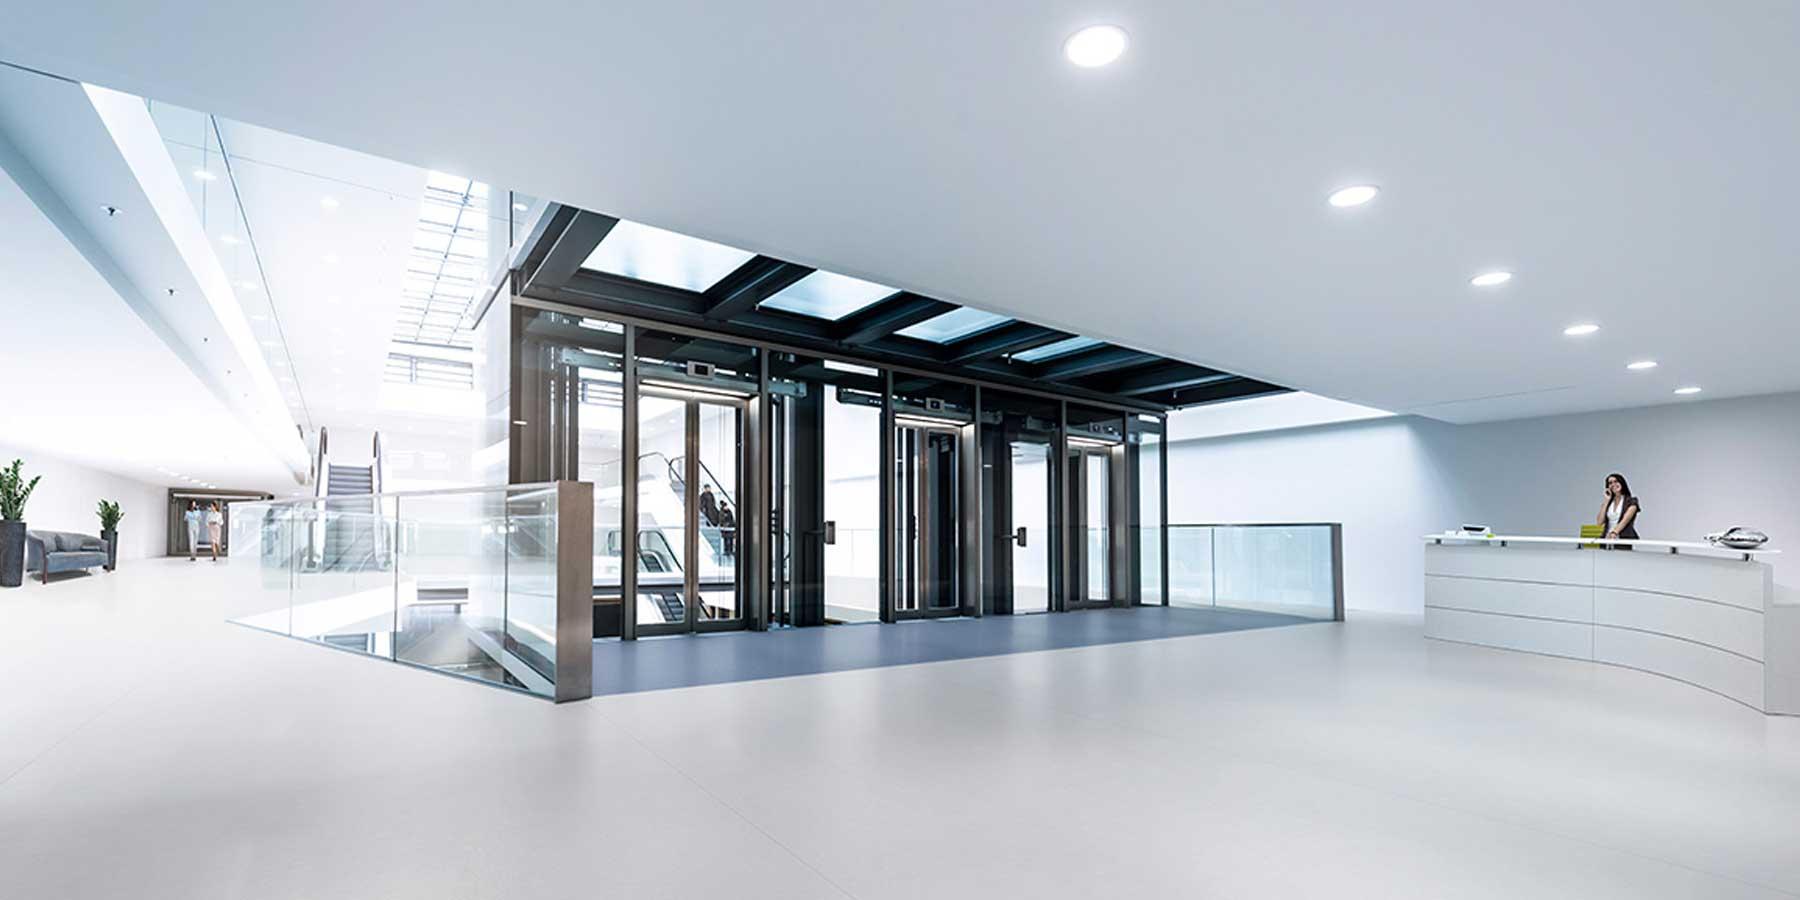 Commercial Entrance Mats from Phoenix Flooring Contractors